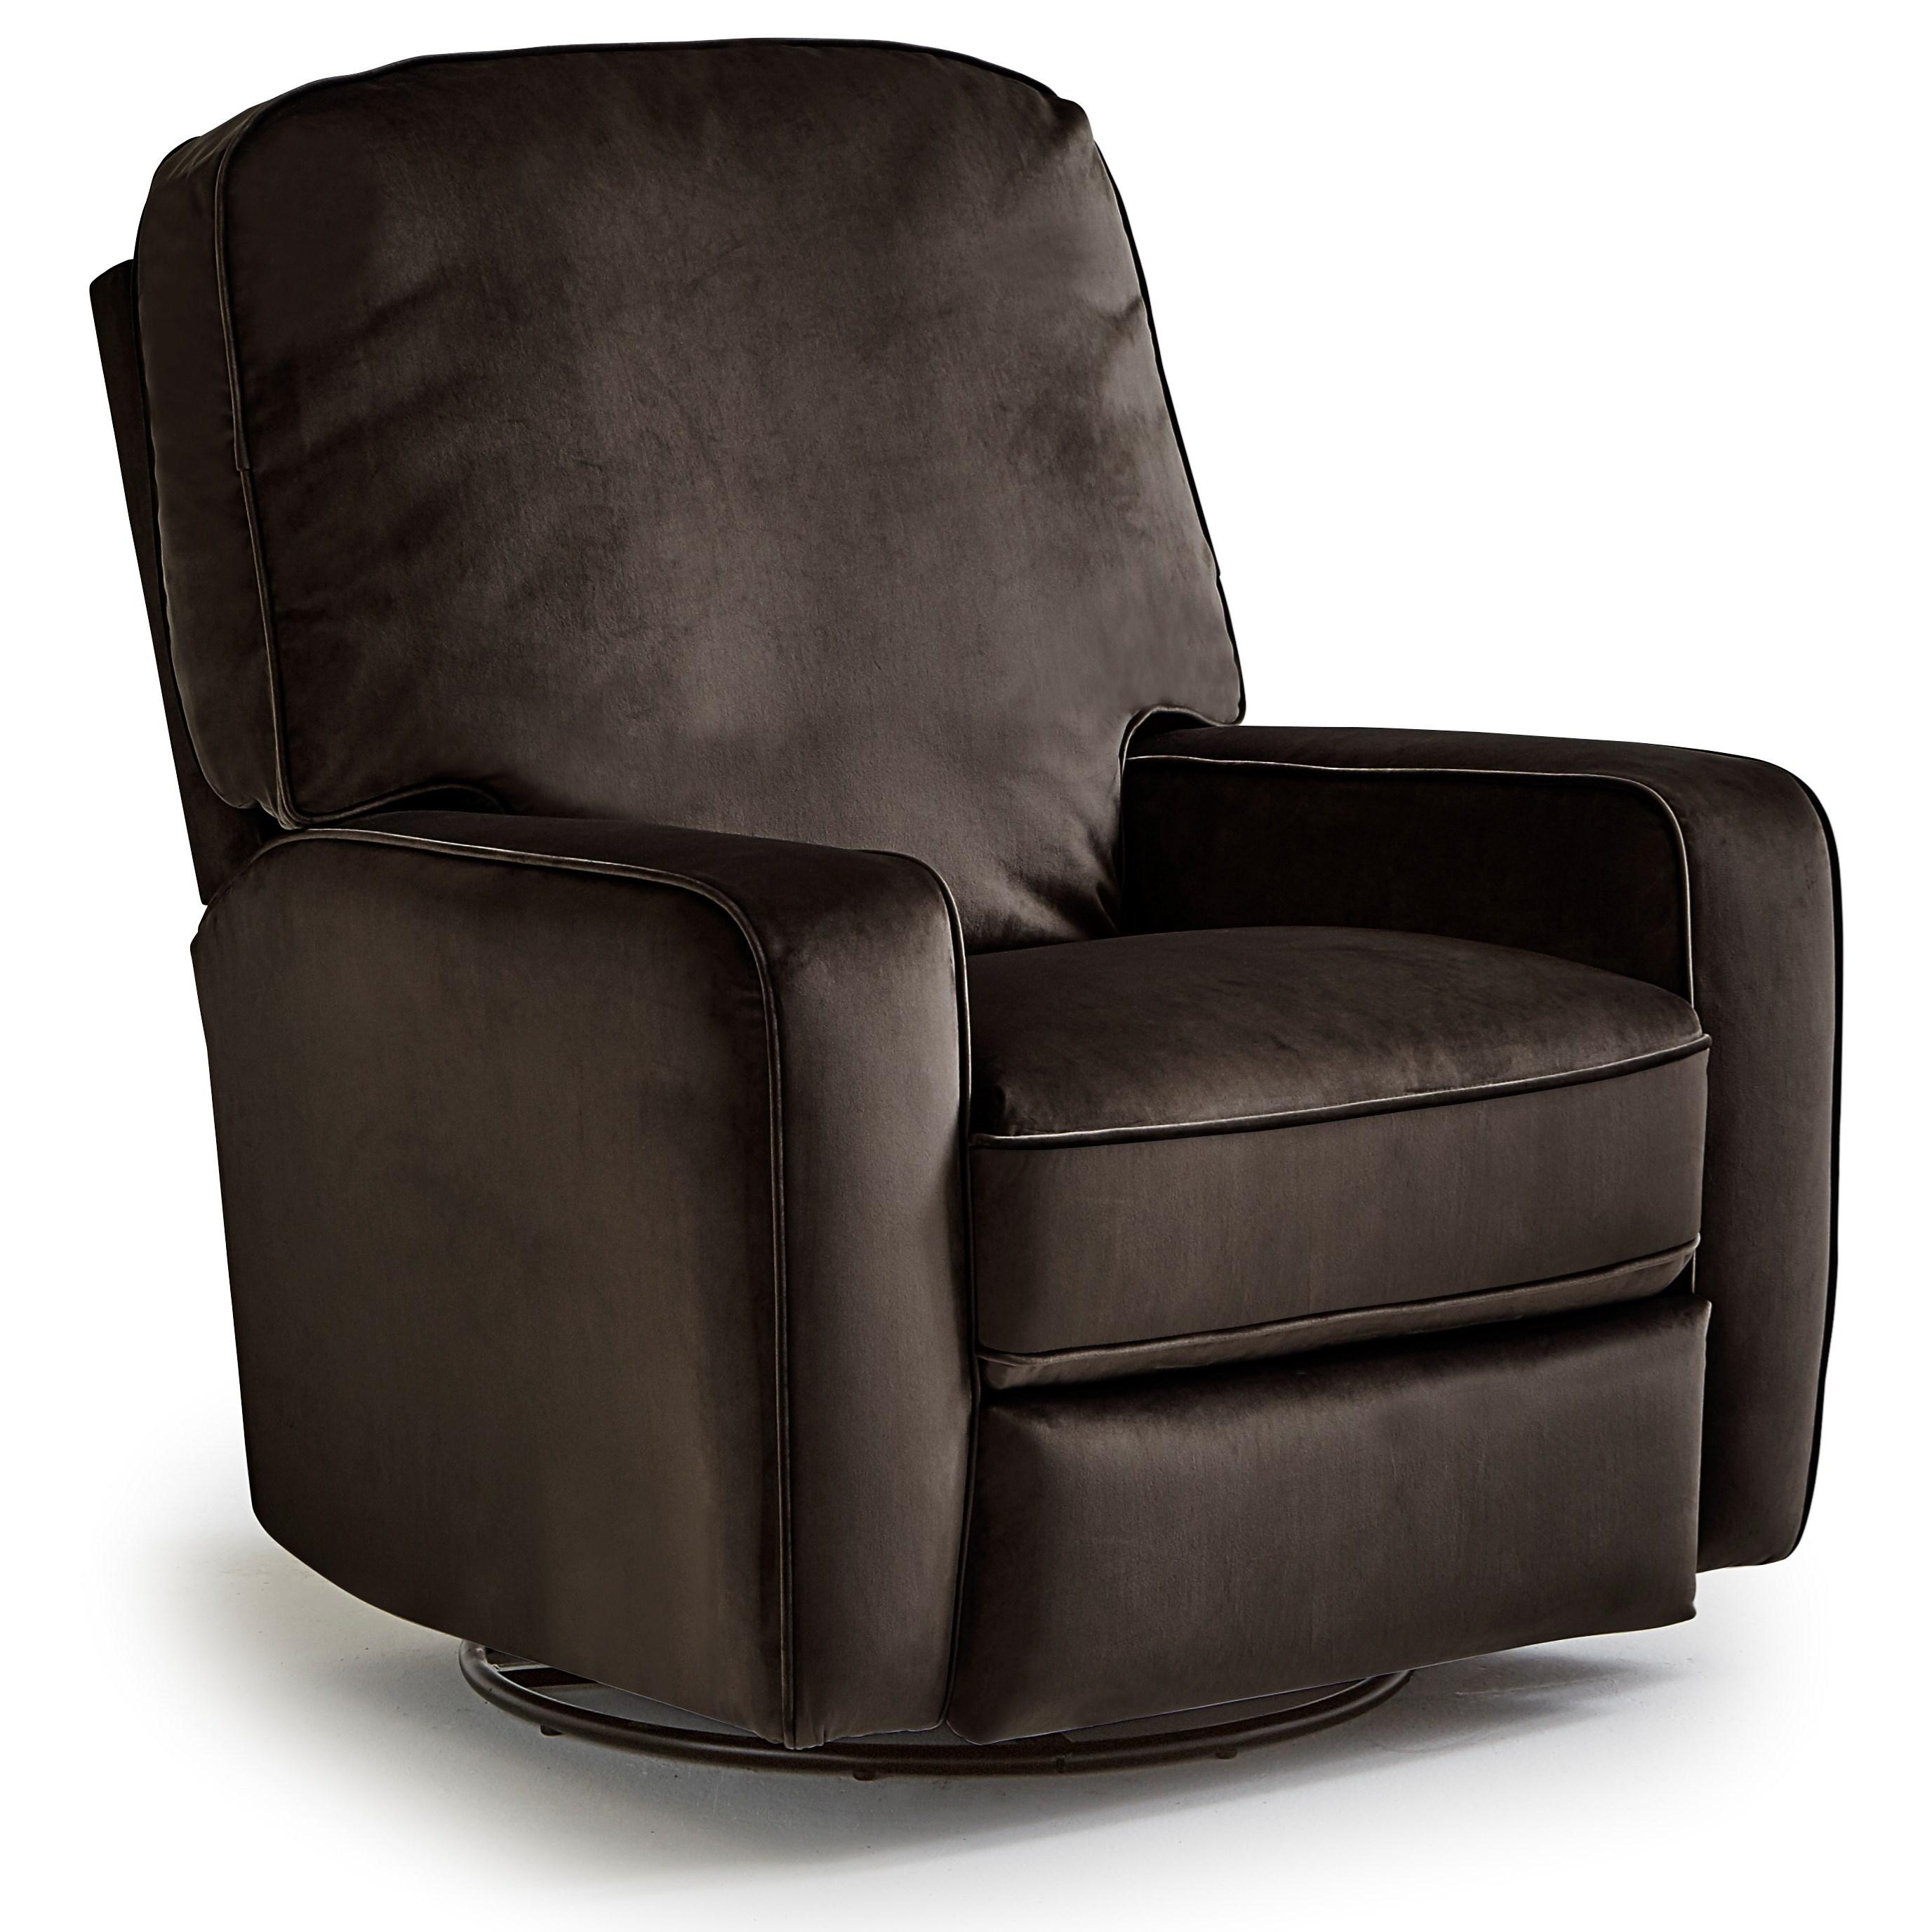 best chairs swivel glider recliner reupholster office chair instructions home furnishings recliners medium 4mi55 bilana